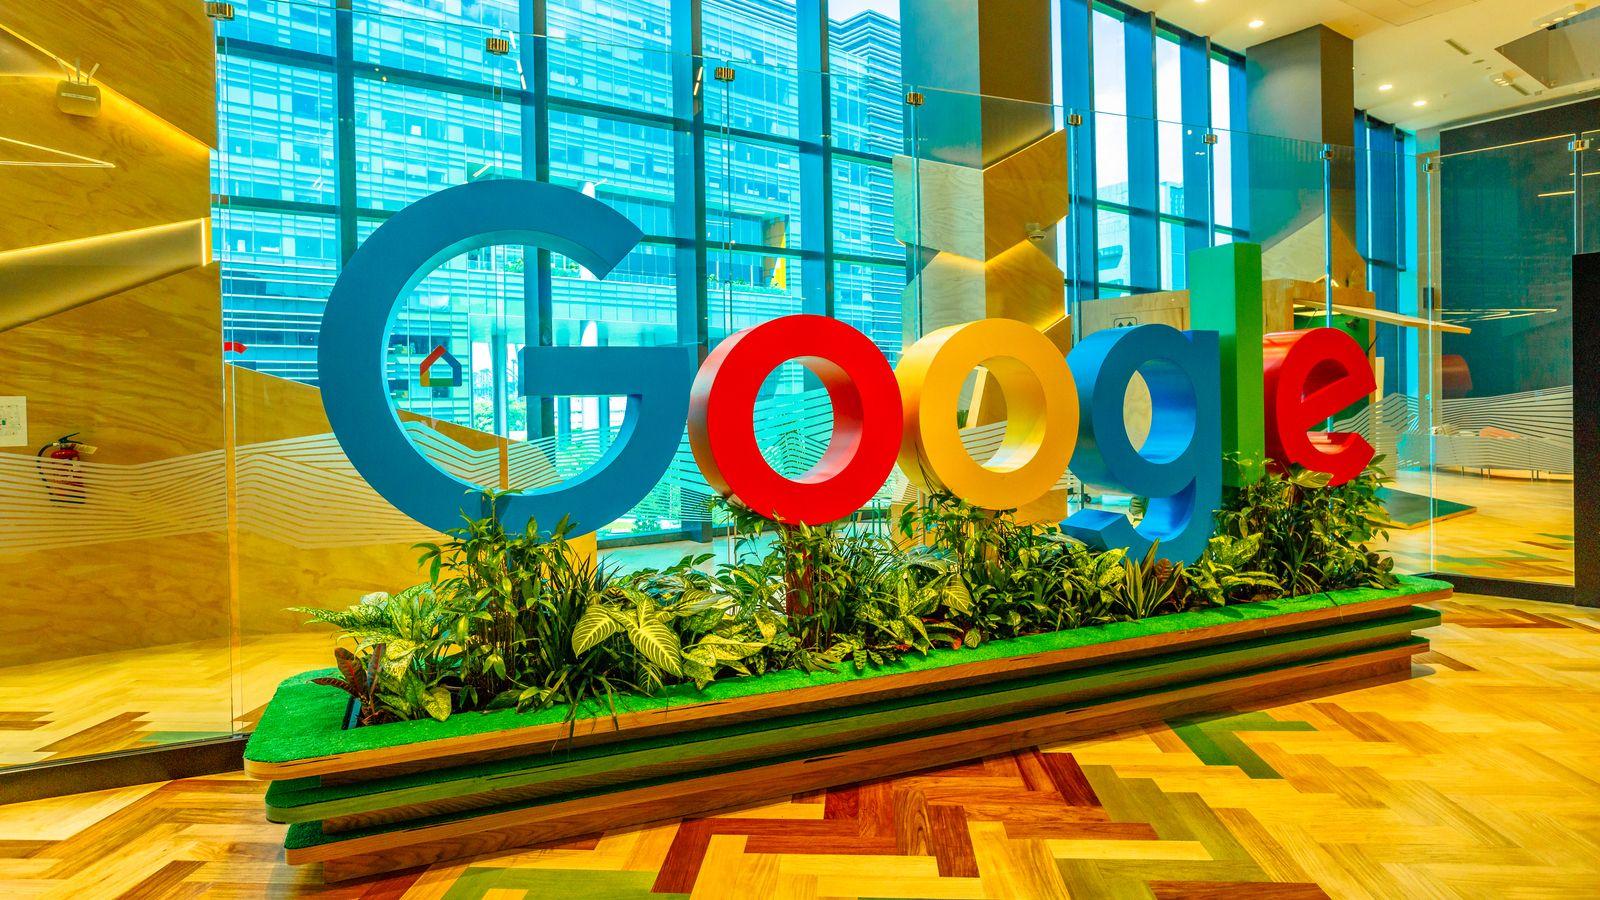 google stock - photo #4